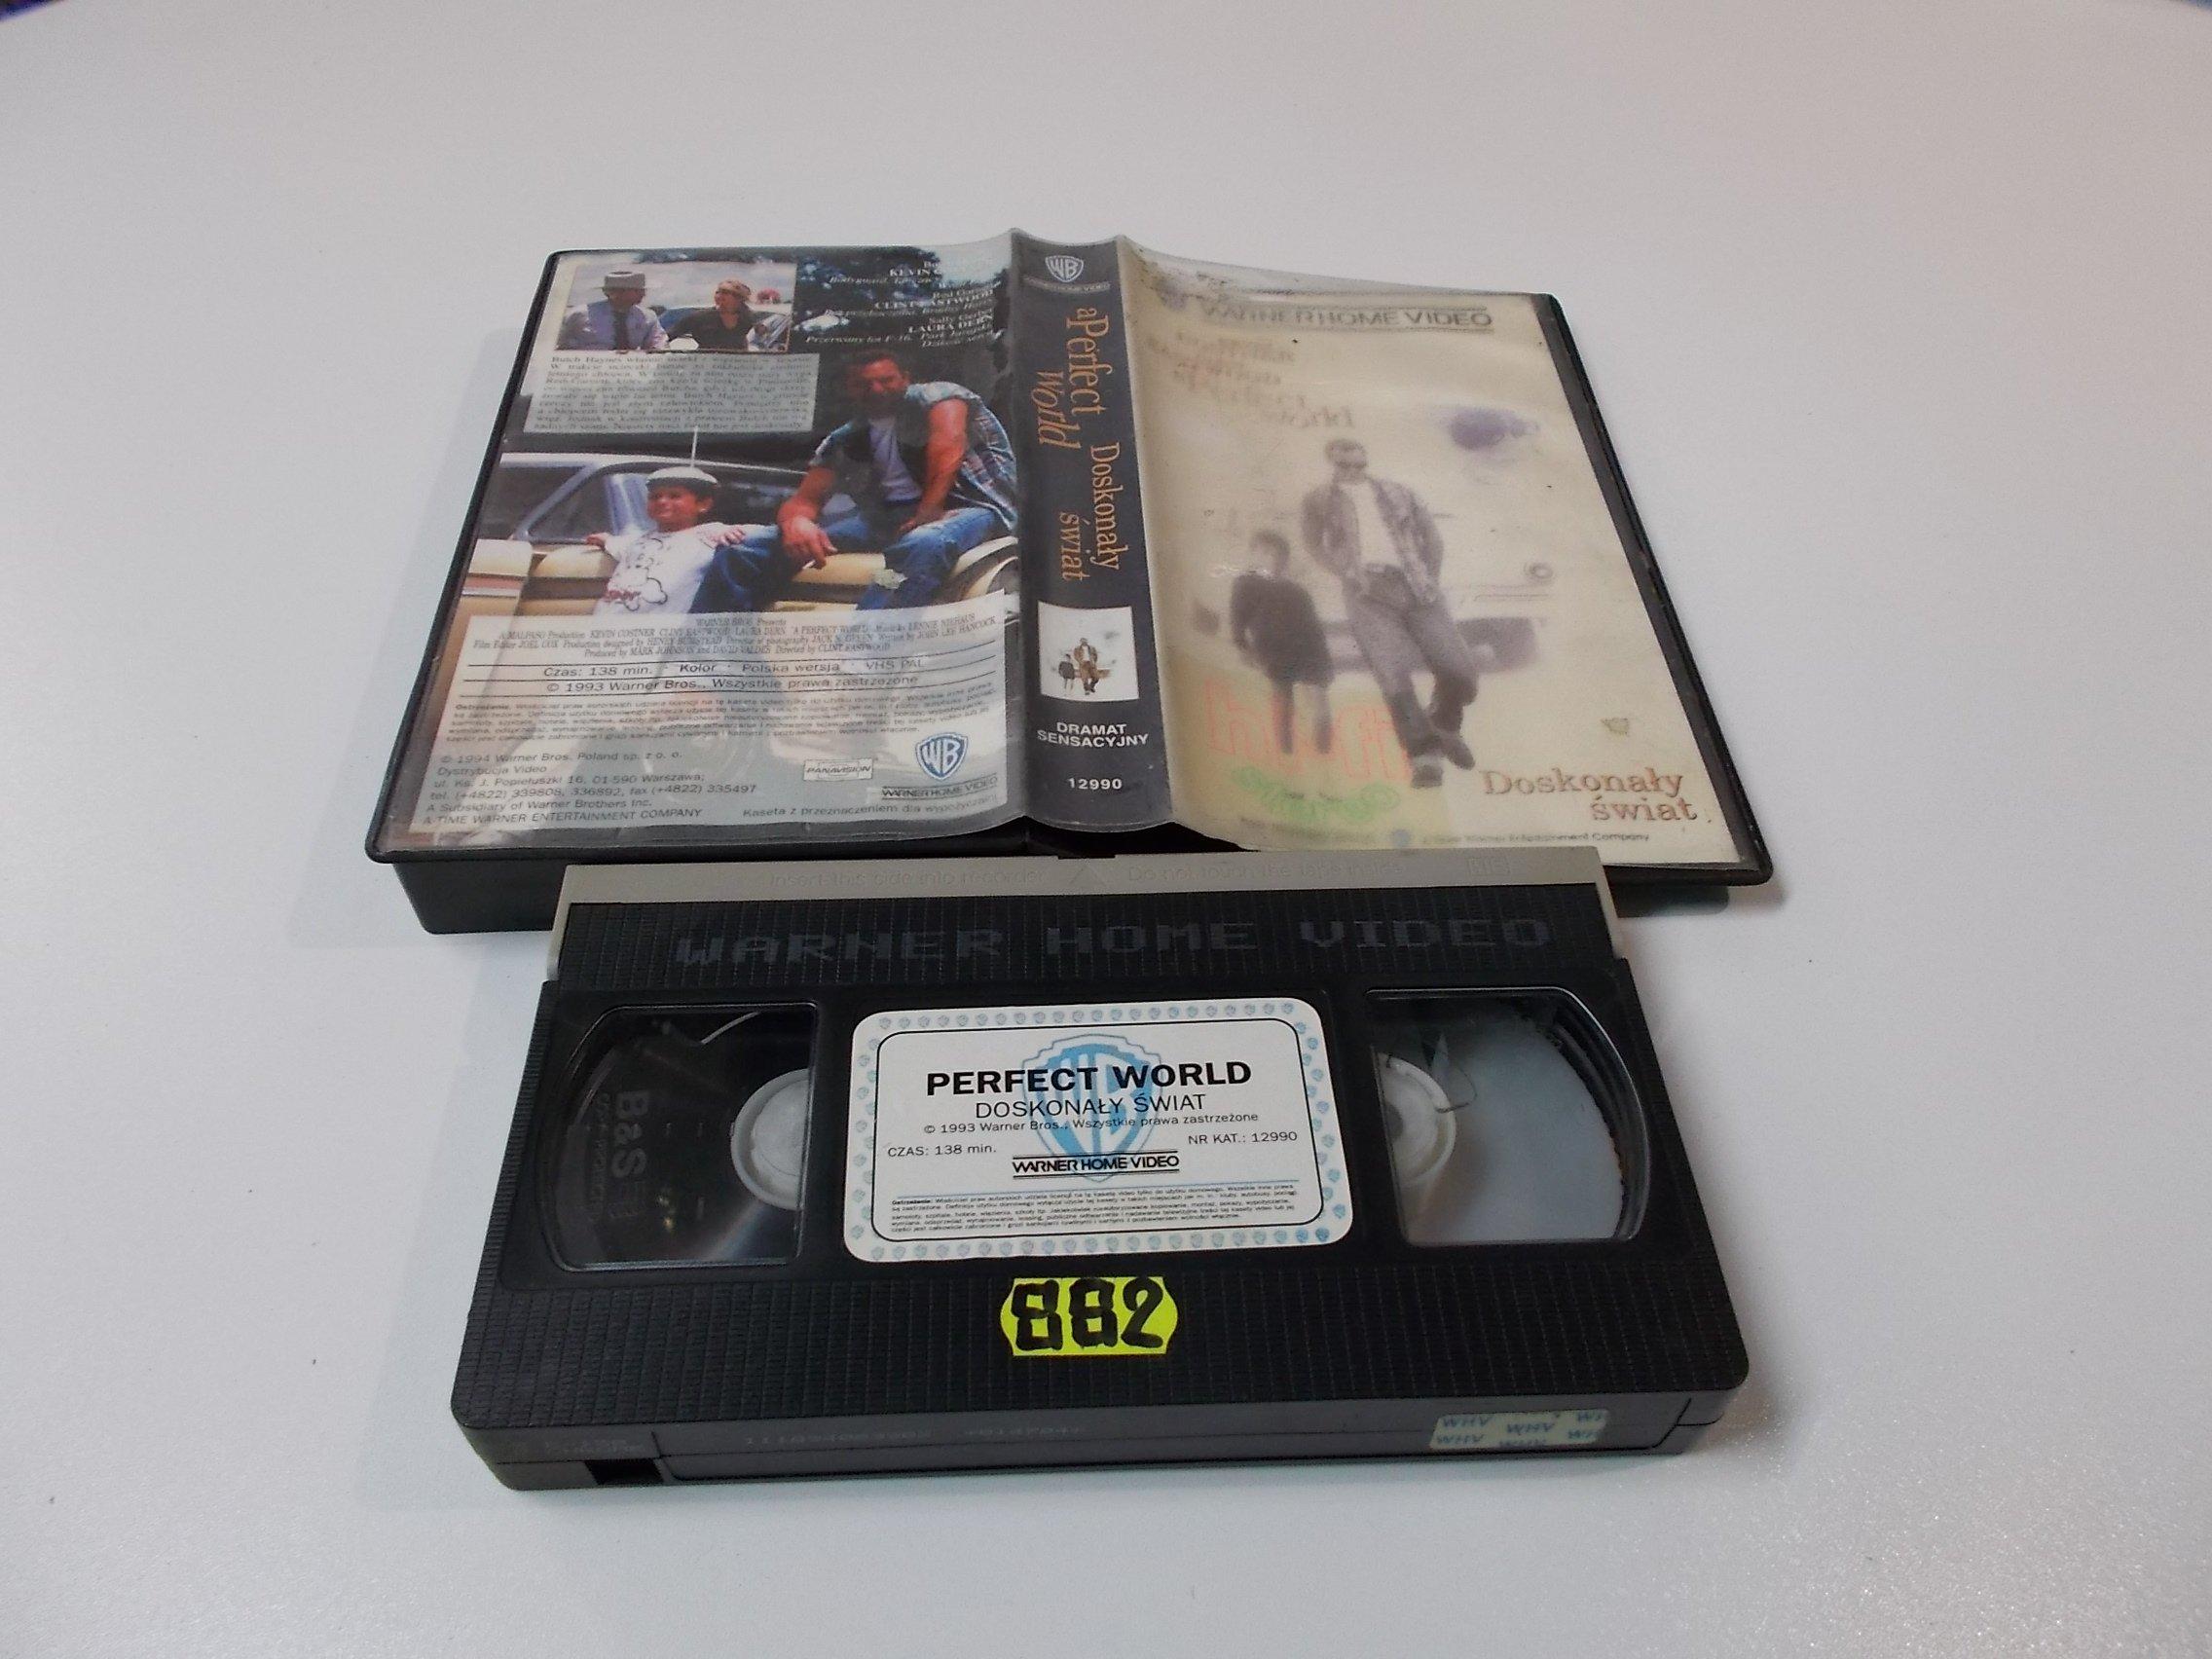 DOSKONAŁY ŚWIAT - VHS Kaseta Video - Opole 1611